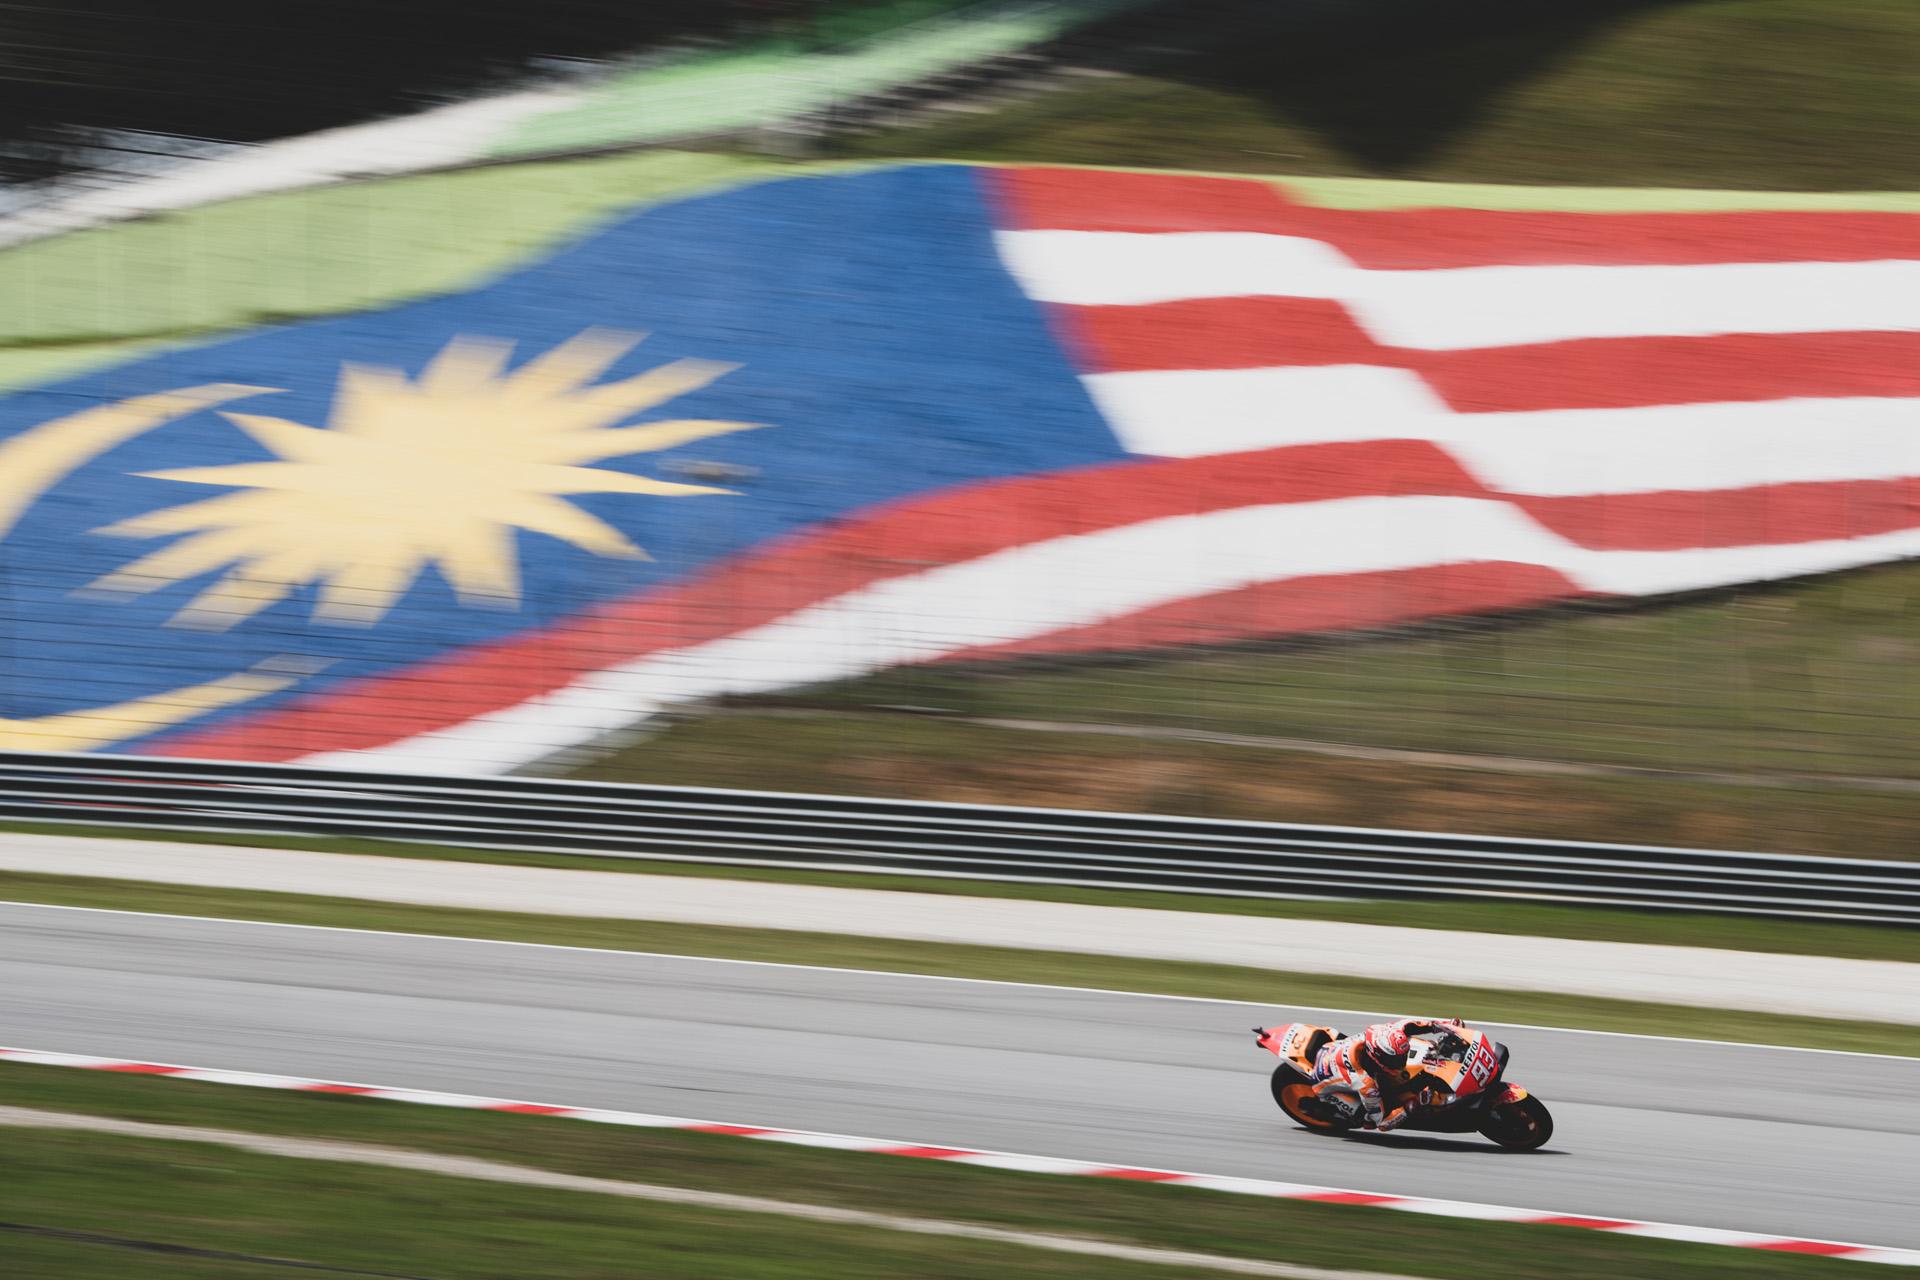 Velká cena Malajsie MotoGP 2019 |Foto Václav Duška Jr.